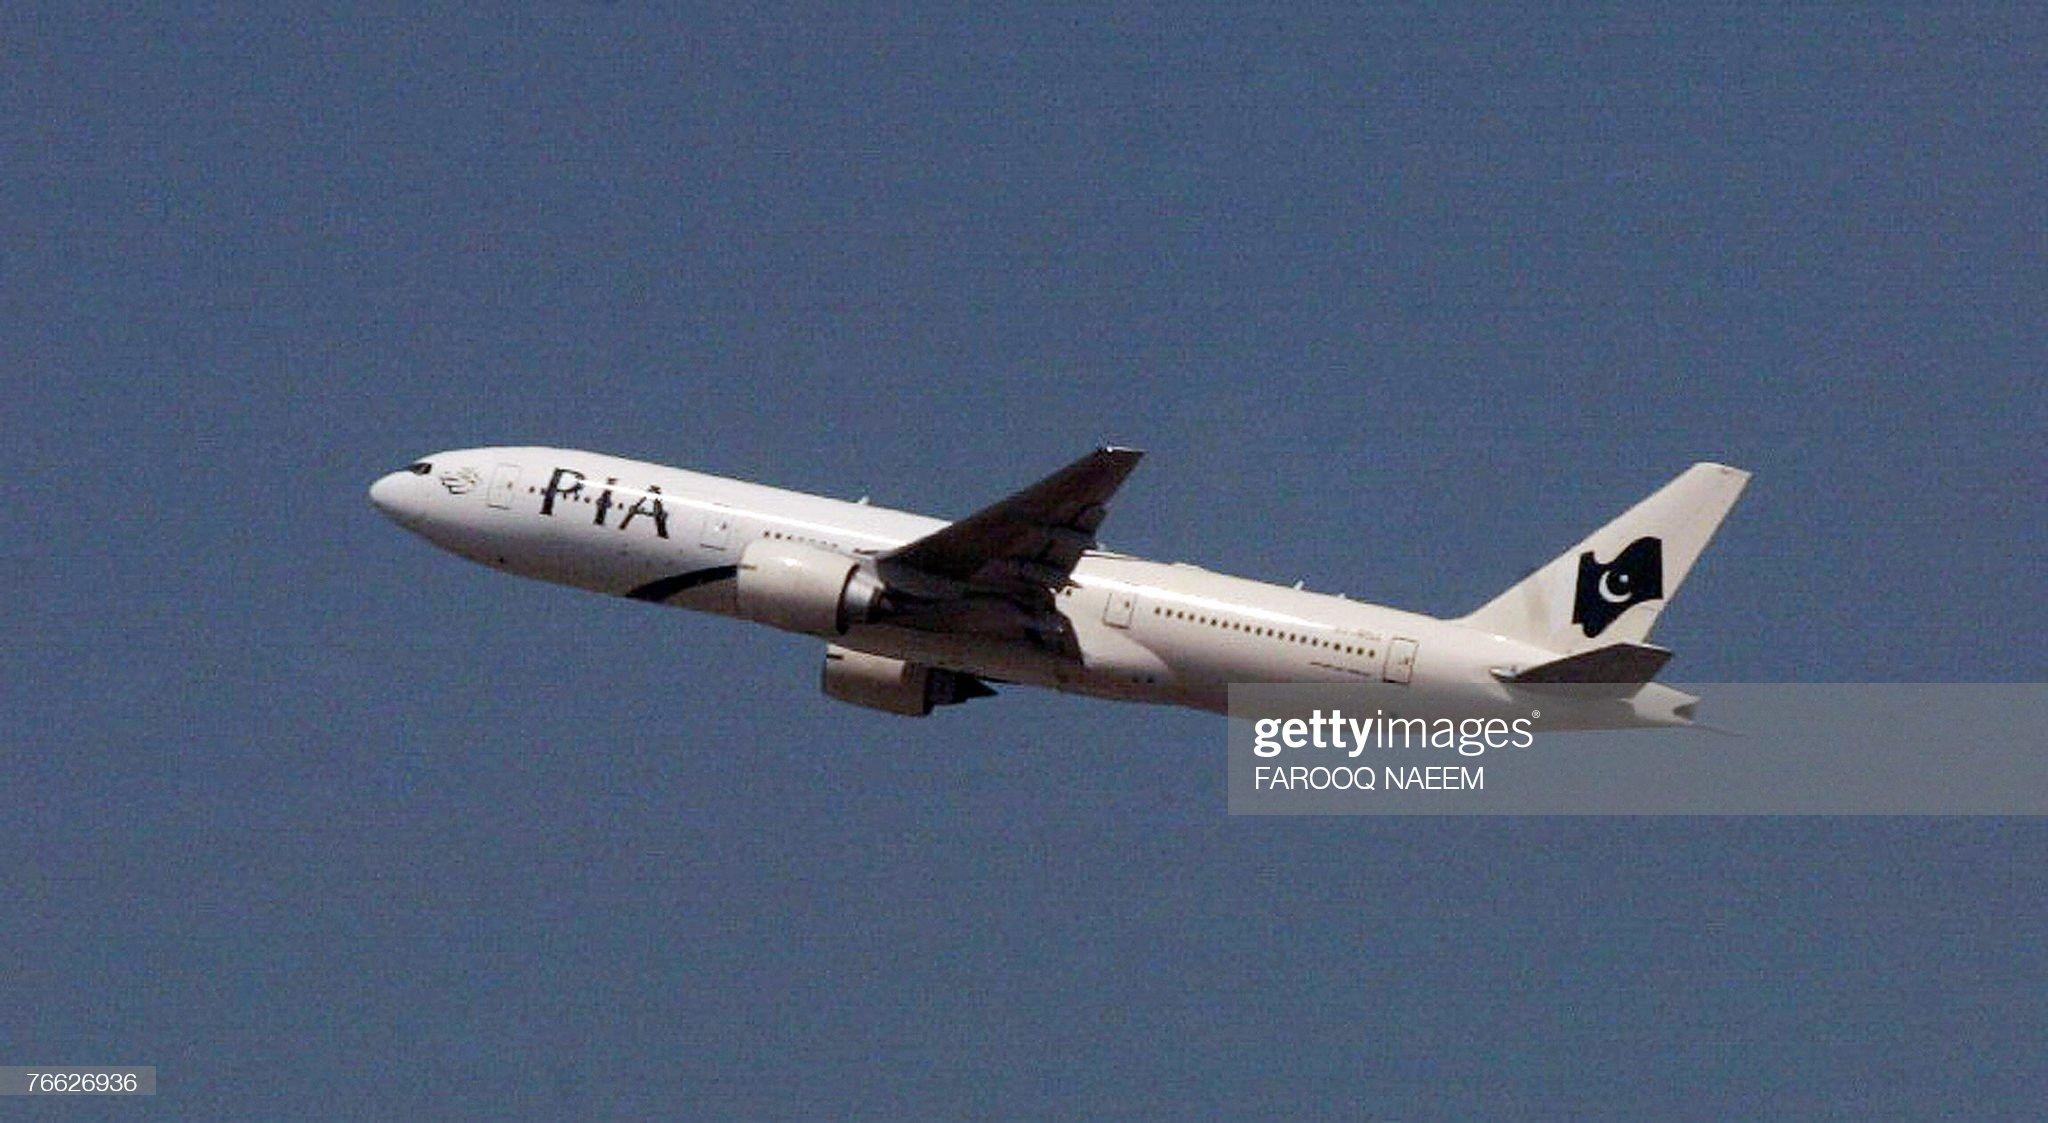 A Pakistan International Airlines plane, : News Photo